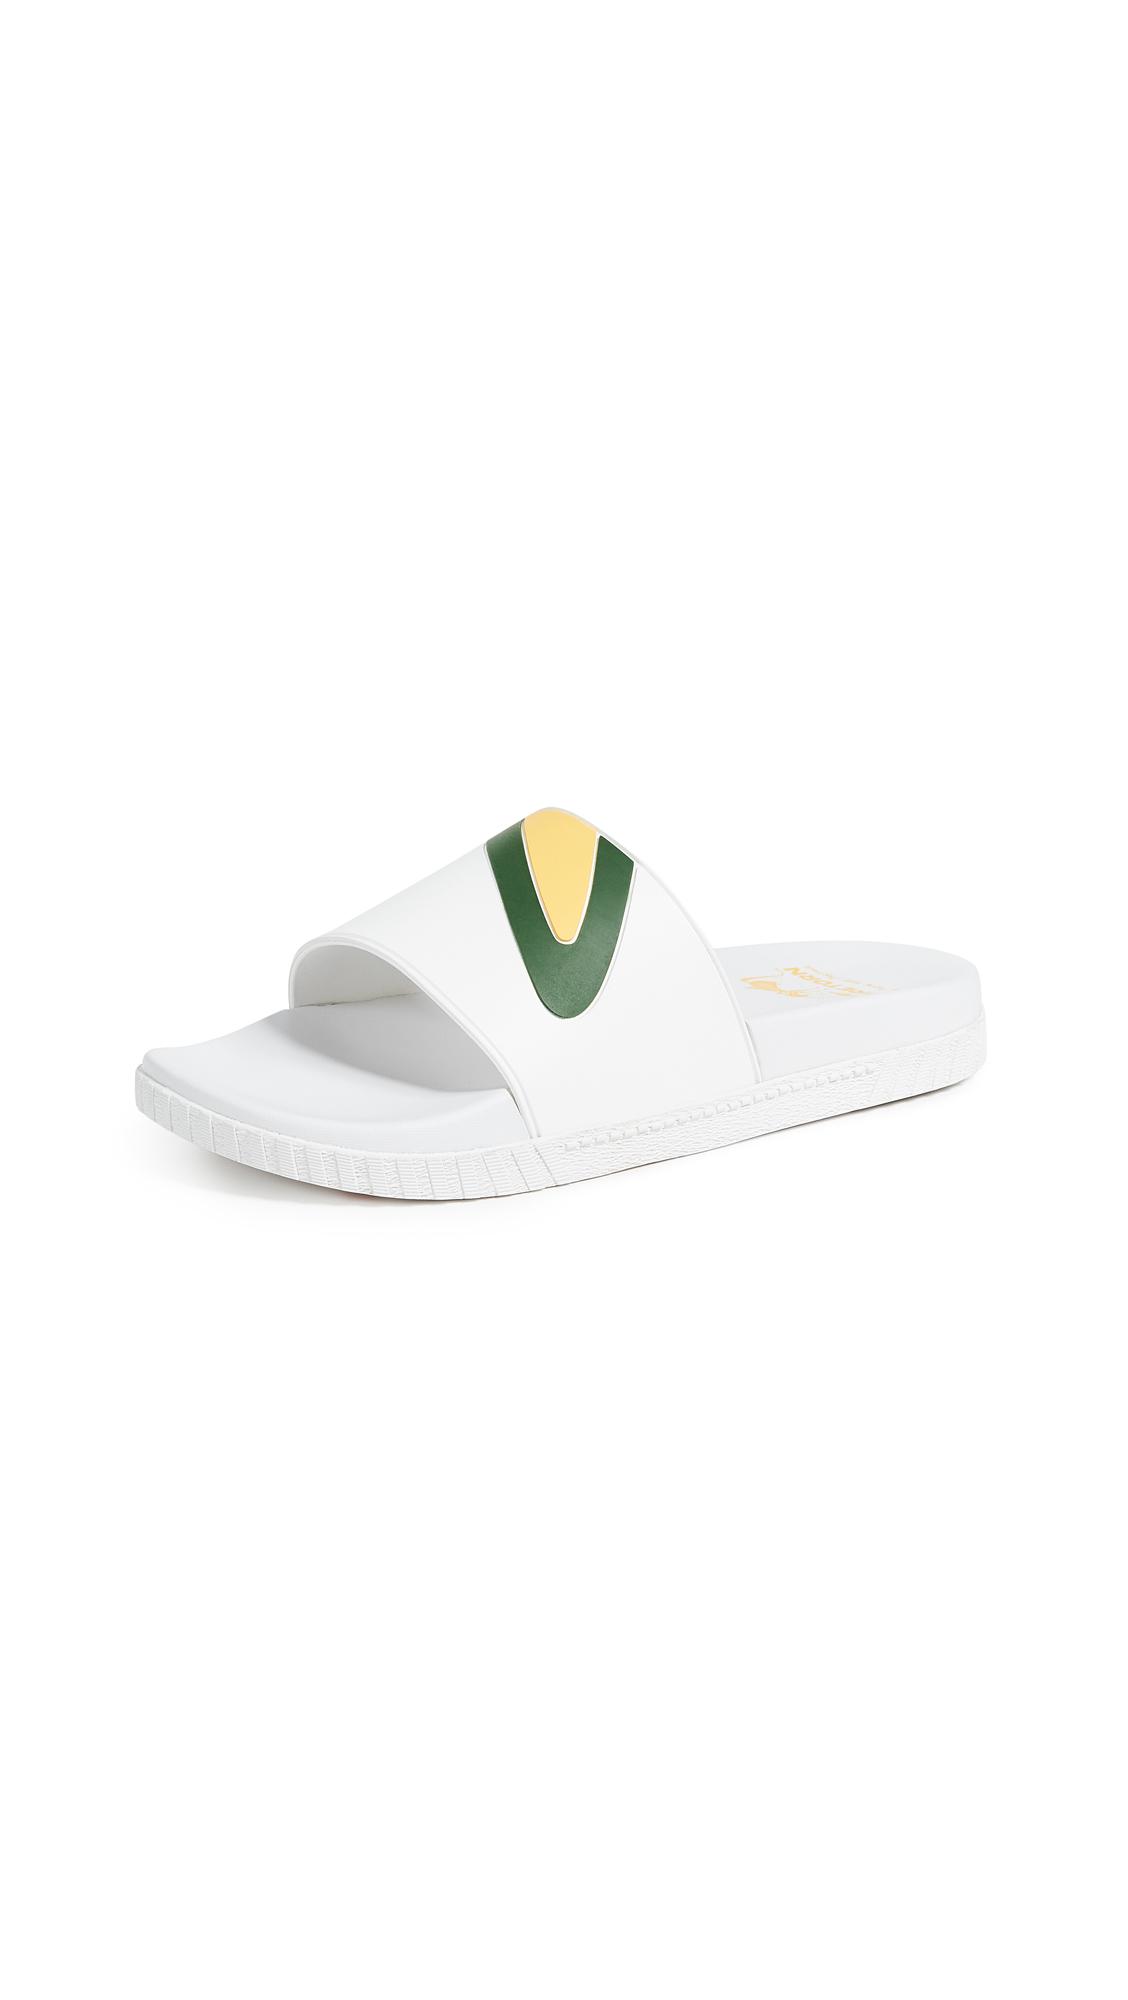 Tretorn Pool Slides - Vintage White